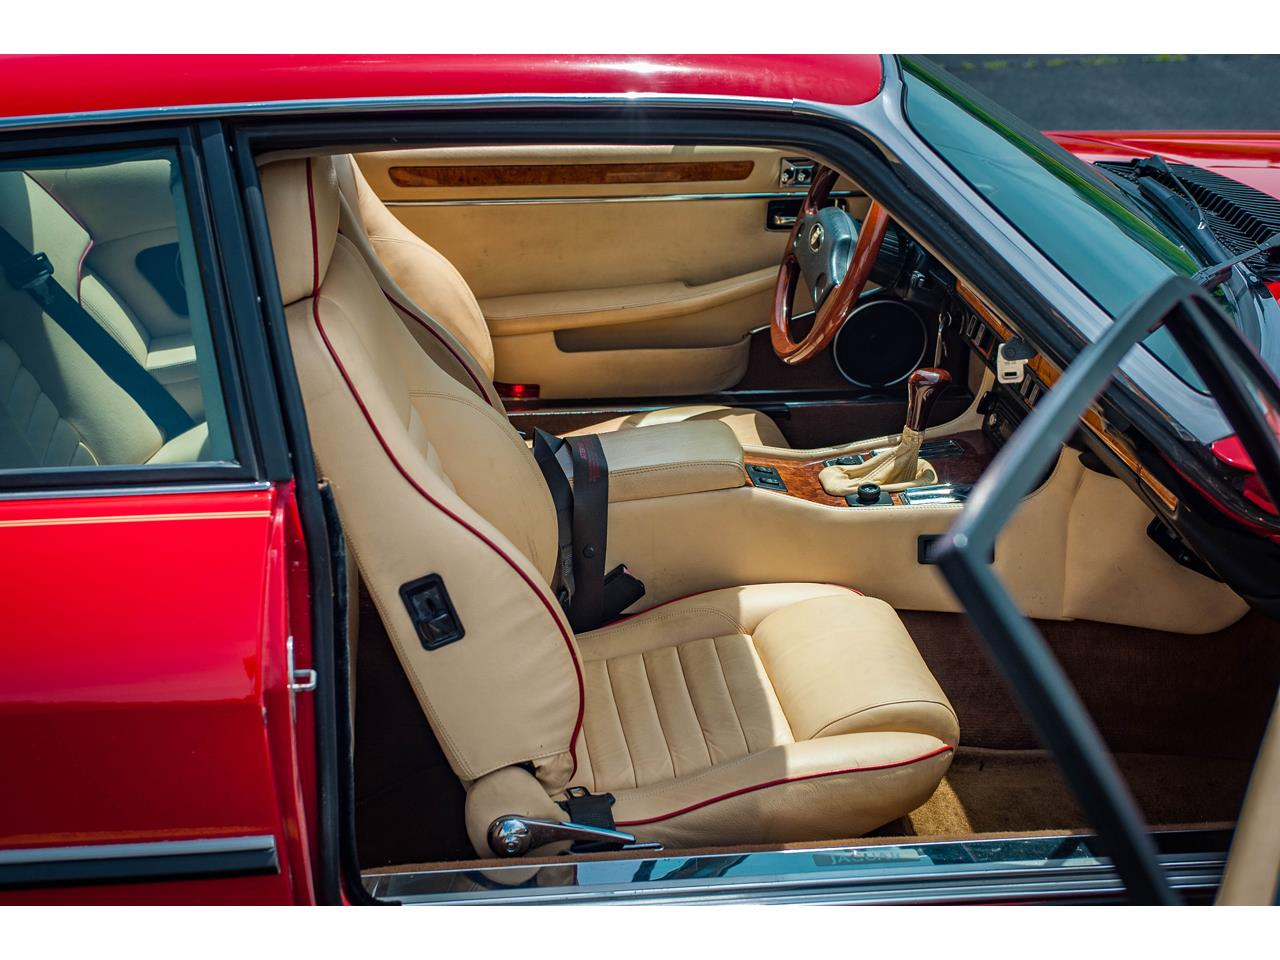 Large Picture of '89 Jaguar XJS located in Illinois - $20,000.00 - QB9L